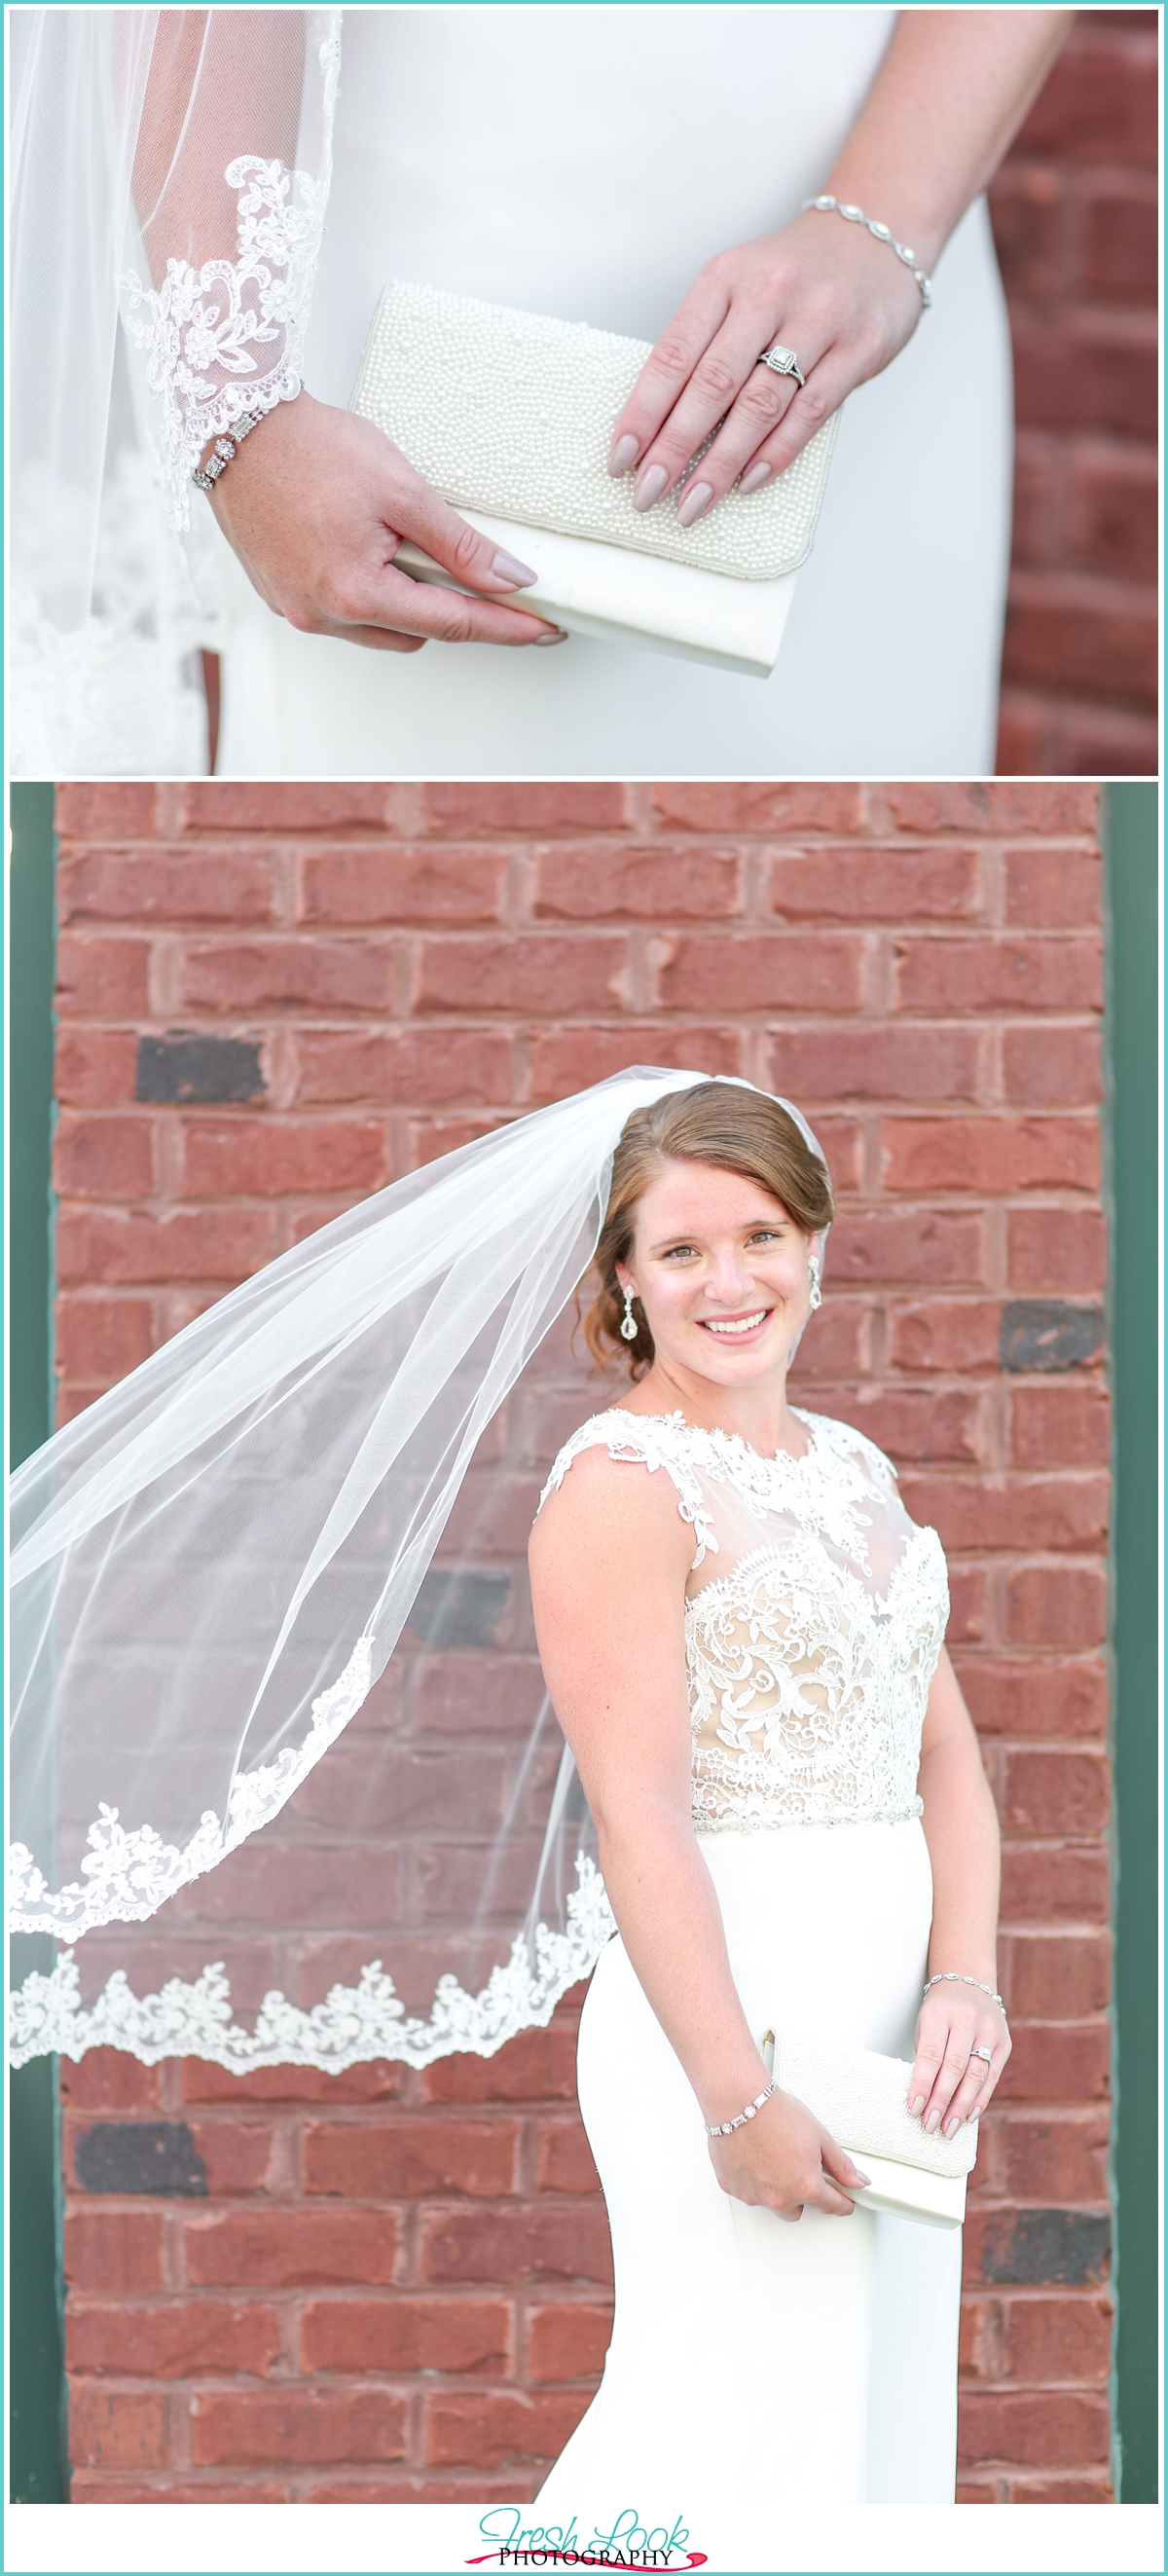 wedding photography with joy